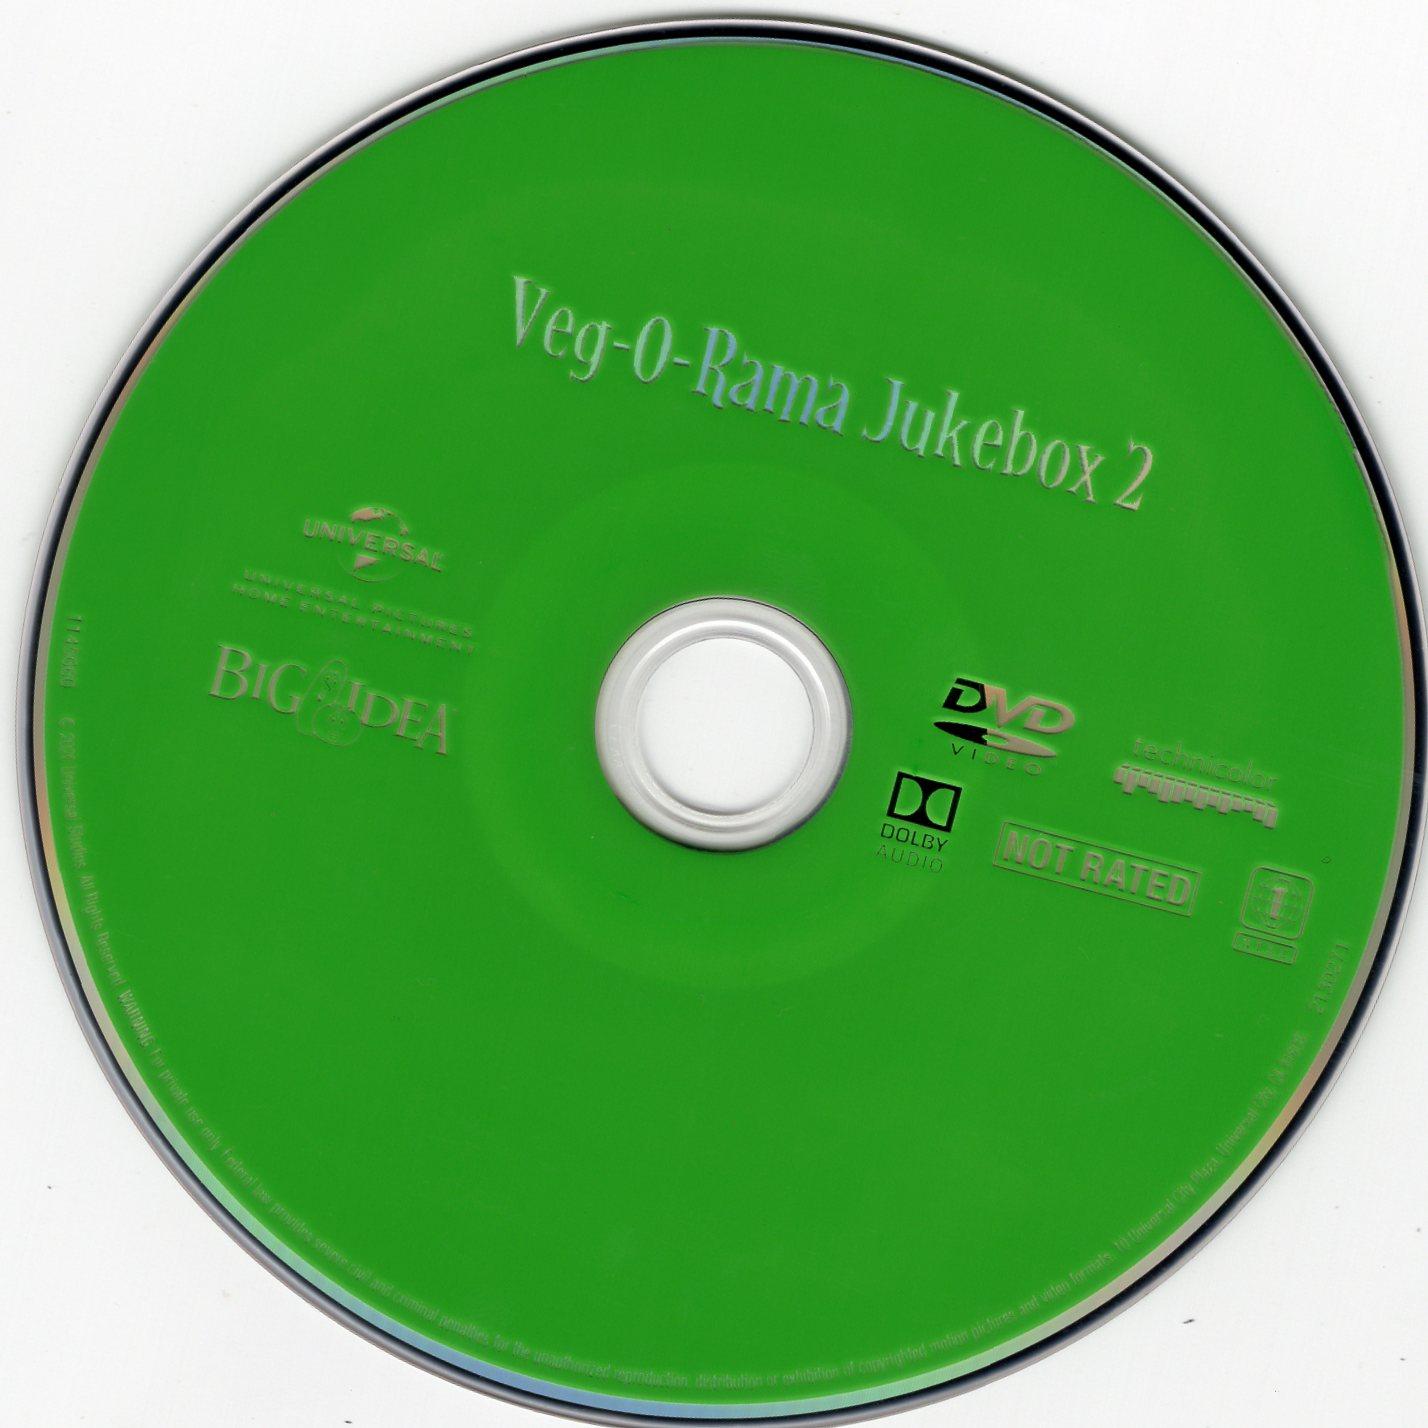 Veg-O-Rama Jukebox 2